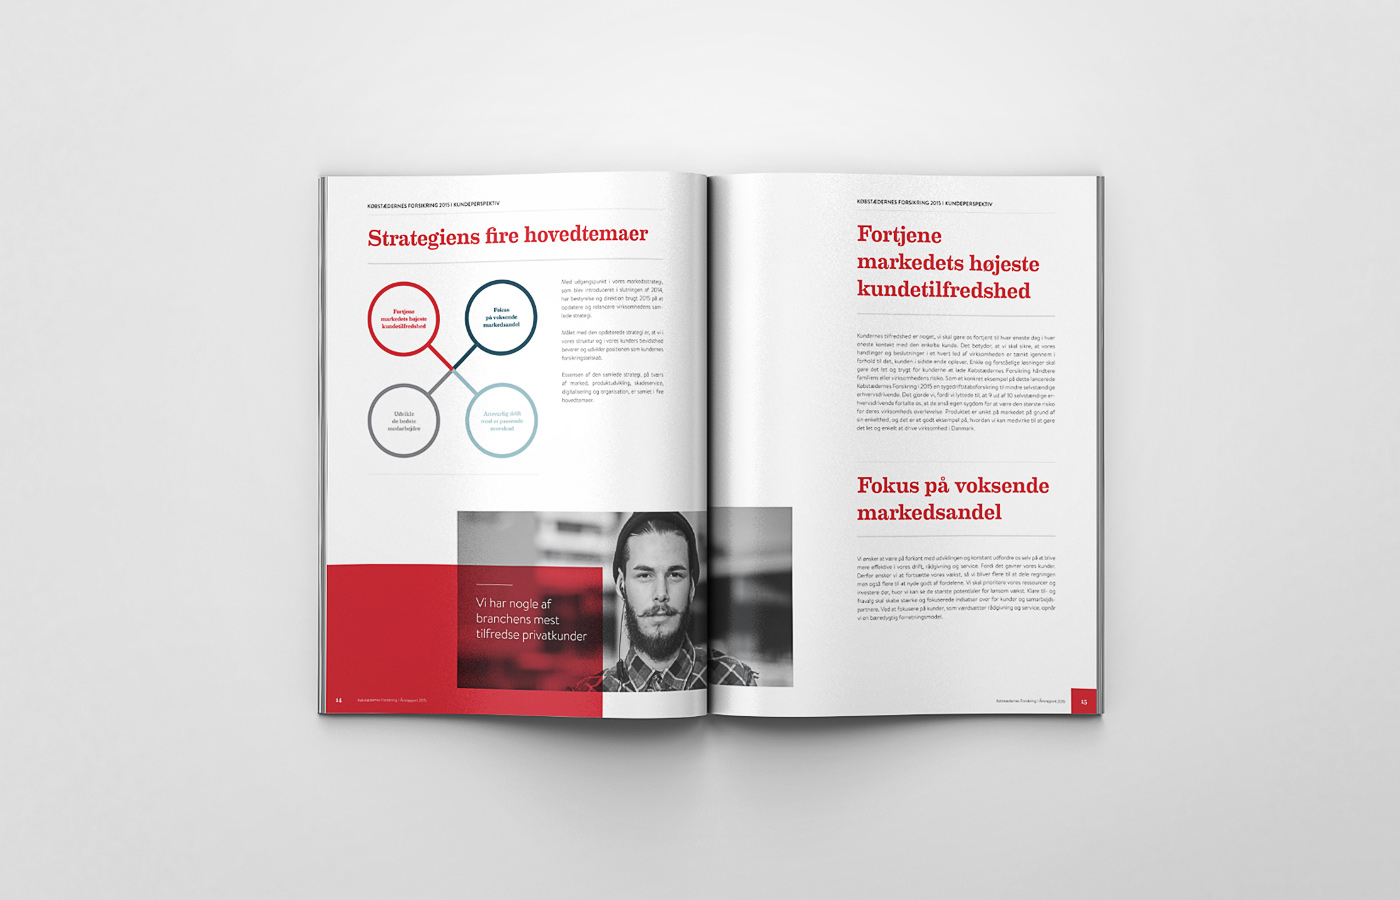 ANNUAL report insurance danish true customer Købstædernes Forsikring Kunder årsrapport